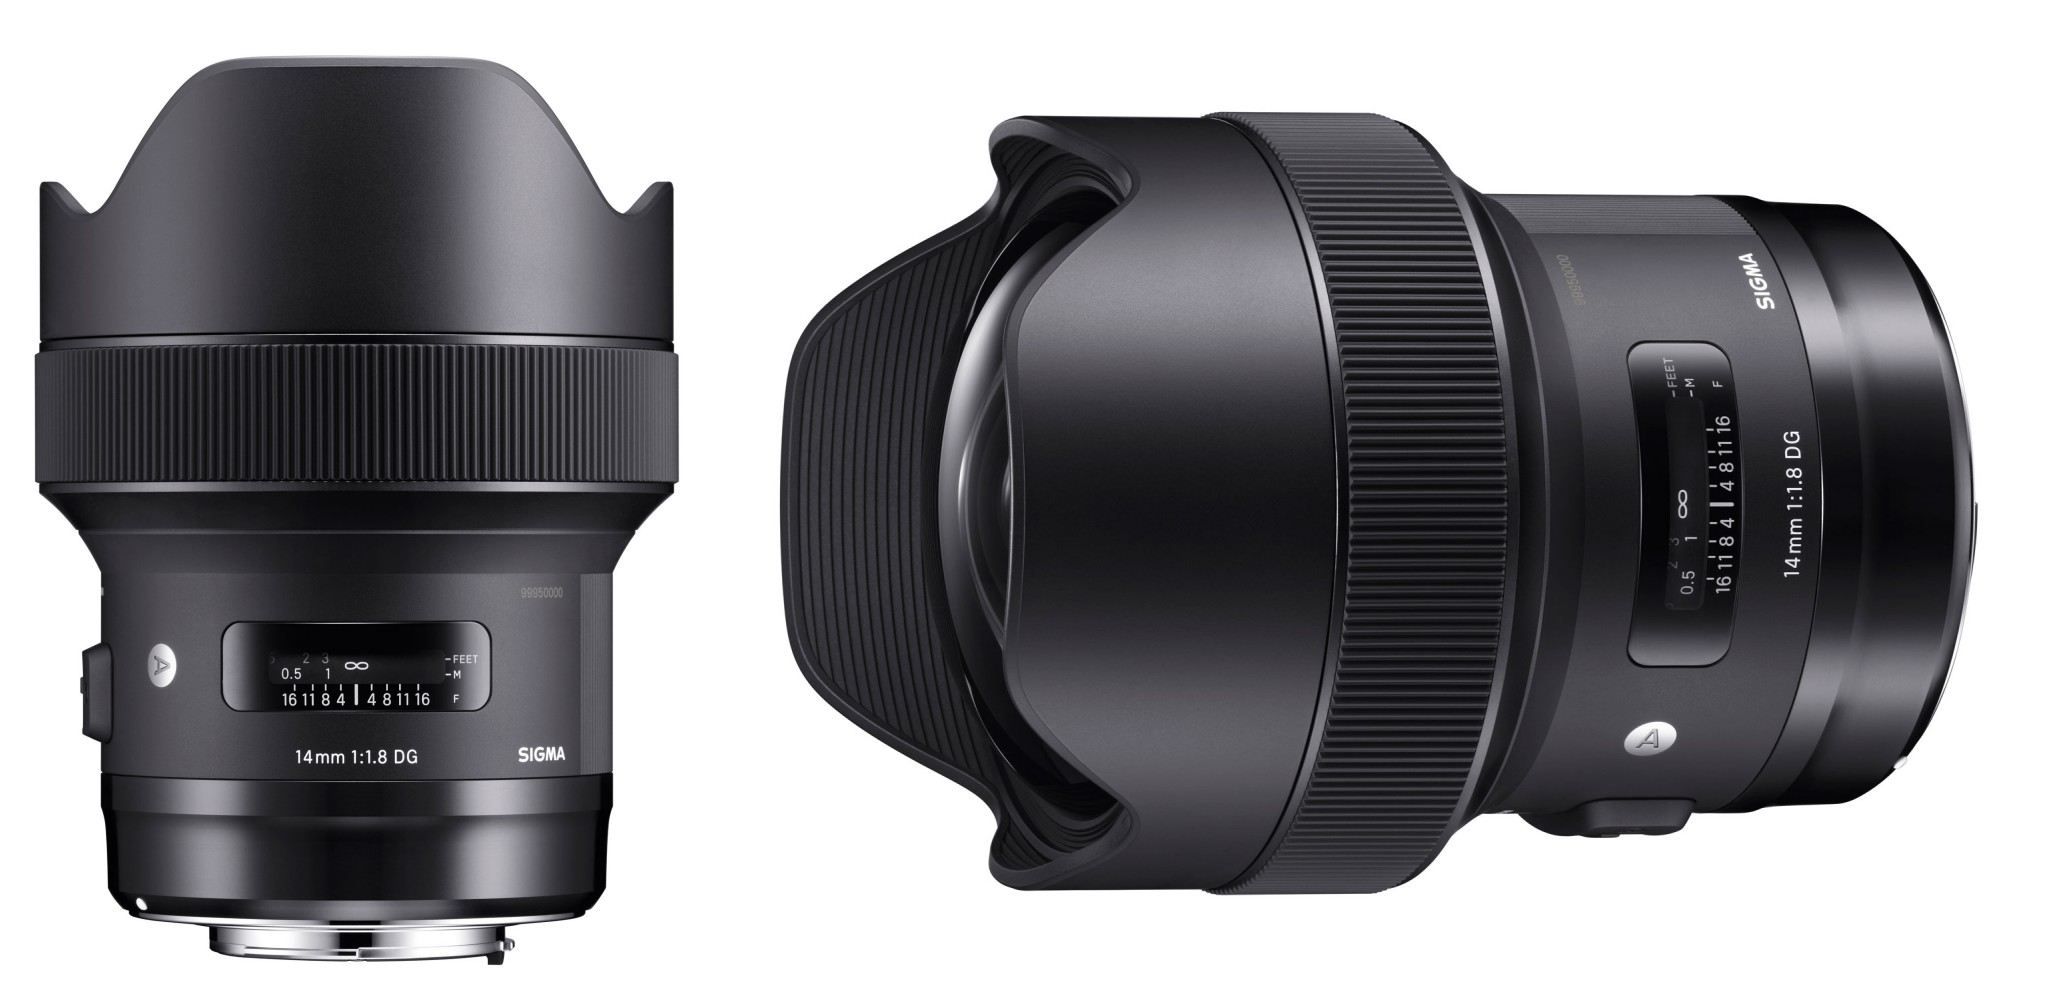 Sigma 14mm F1.8 art camera.tinhte.vn.jpg